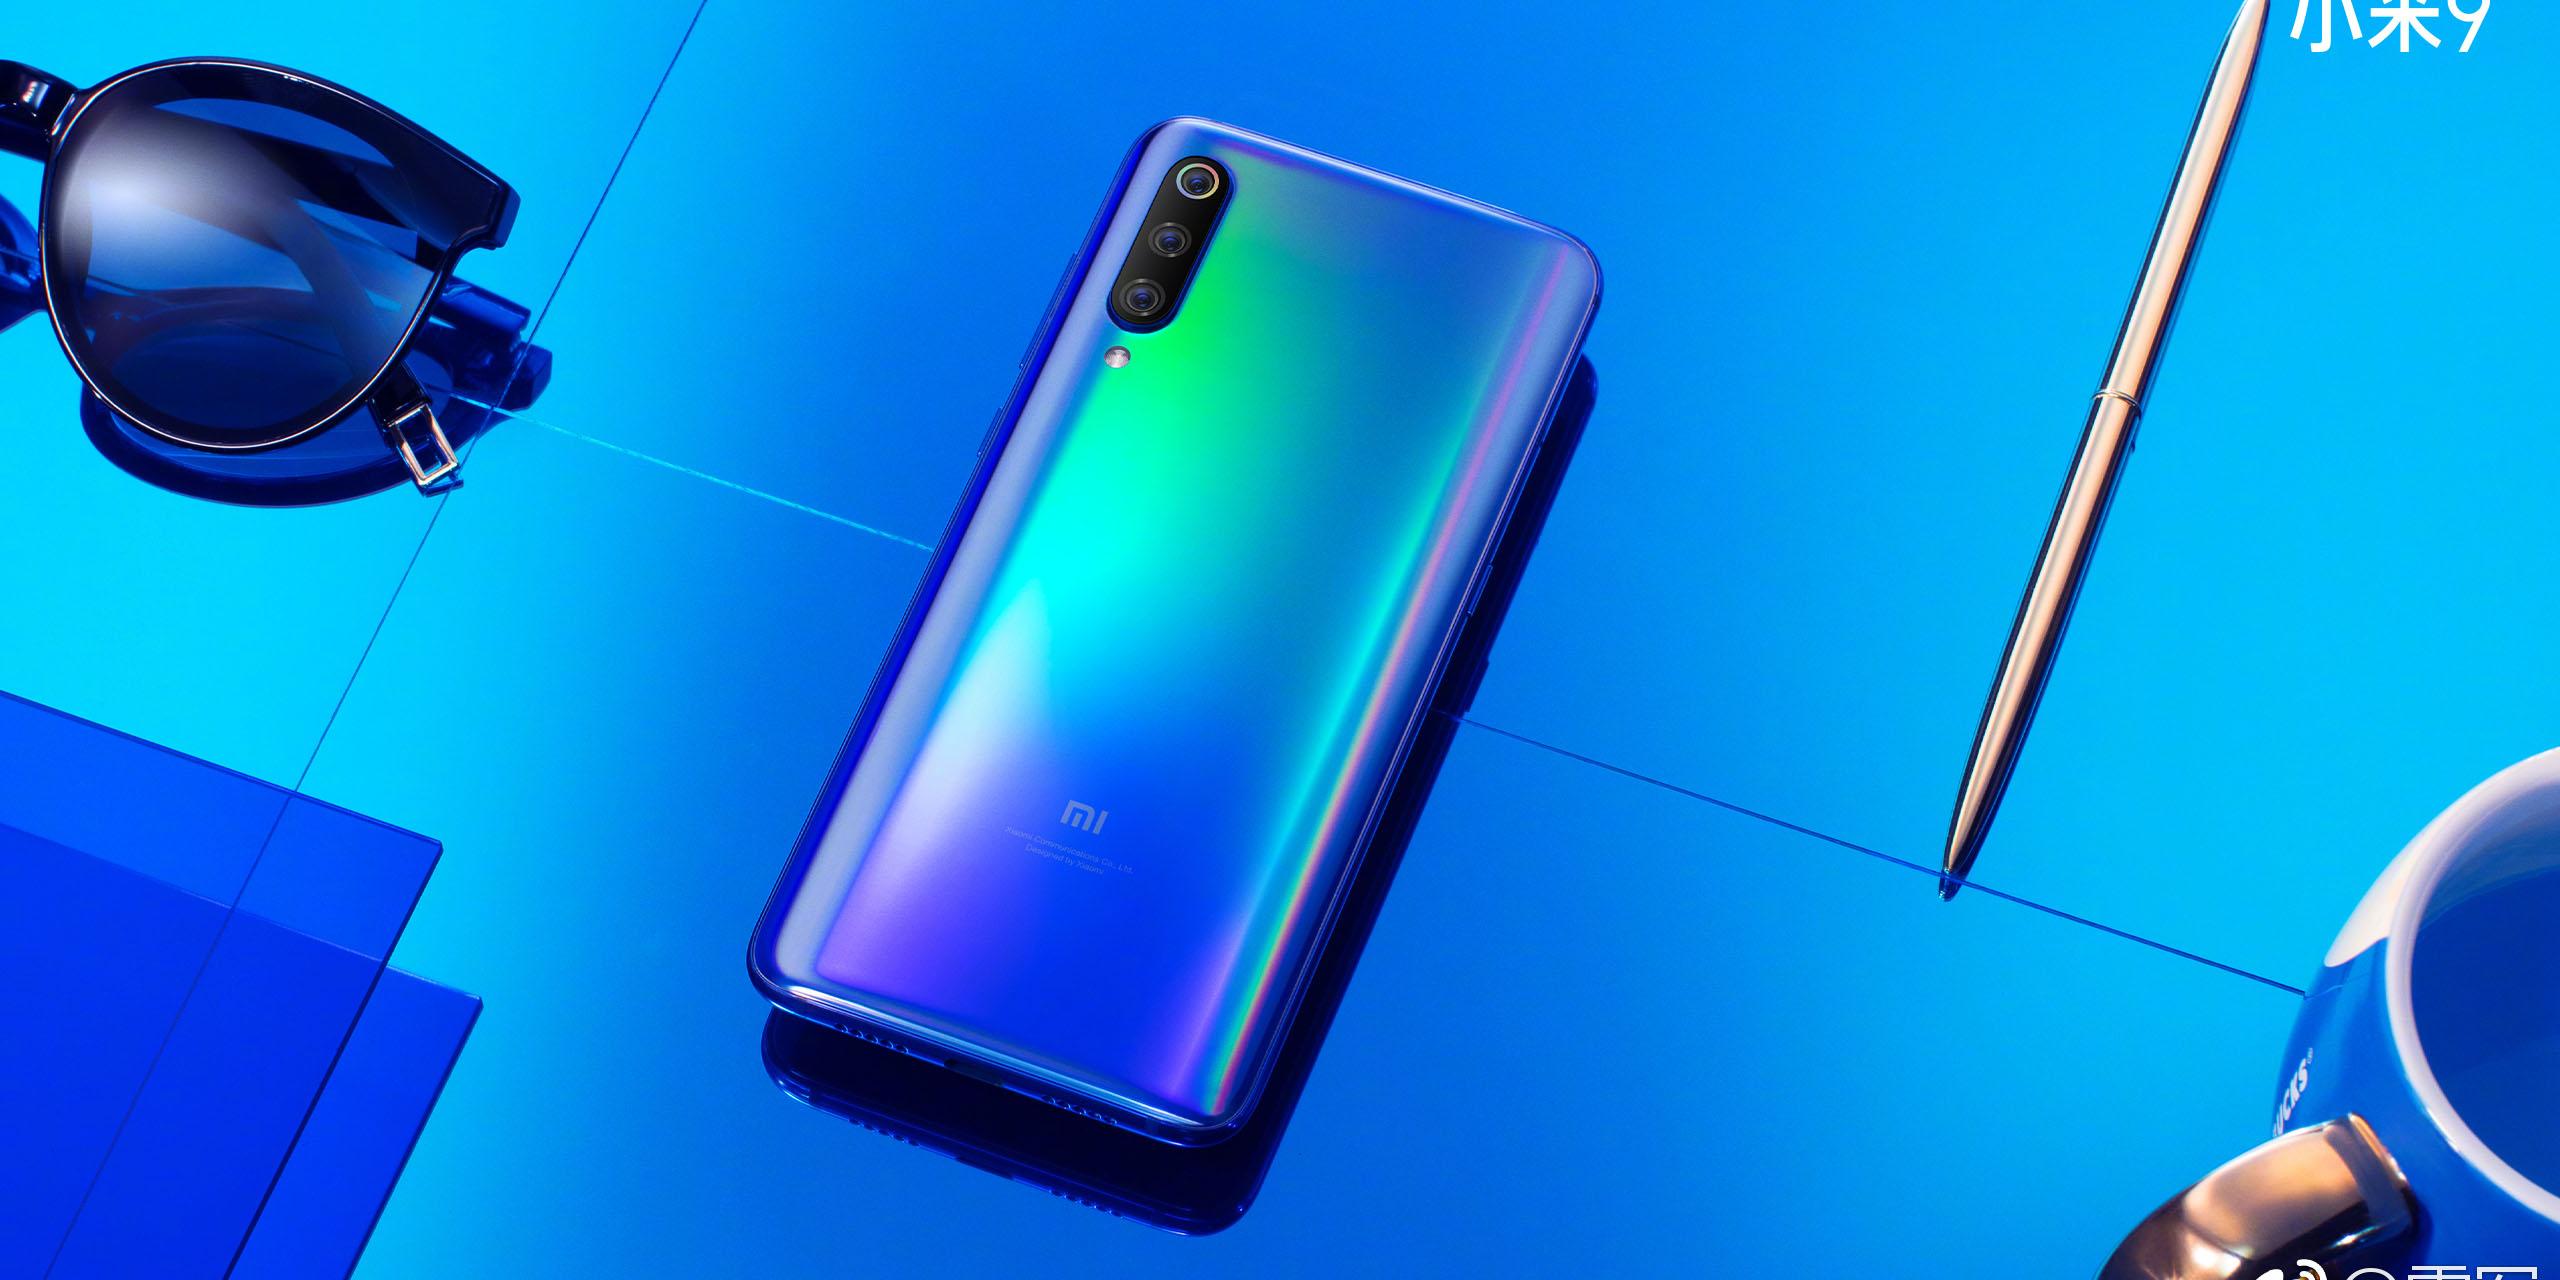 Xiaomi Mi 9 has a 'holographic' paint job, triple cameras, arrives February 24th